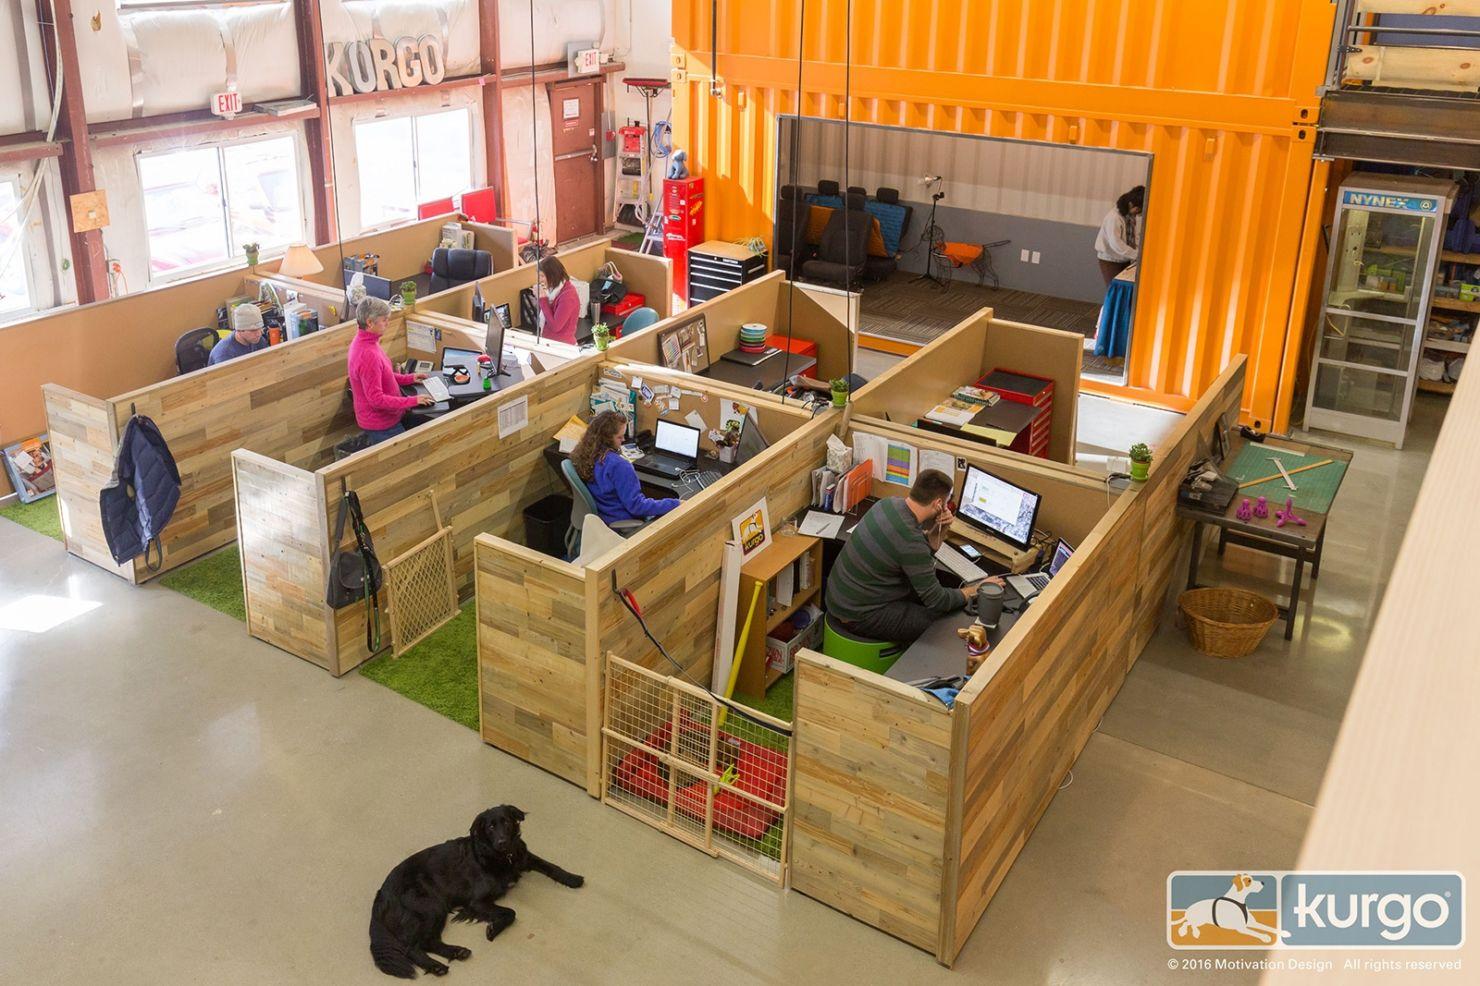 Kurgo - офіс в якому люблять собак. Фото 2